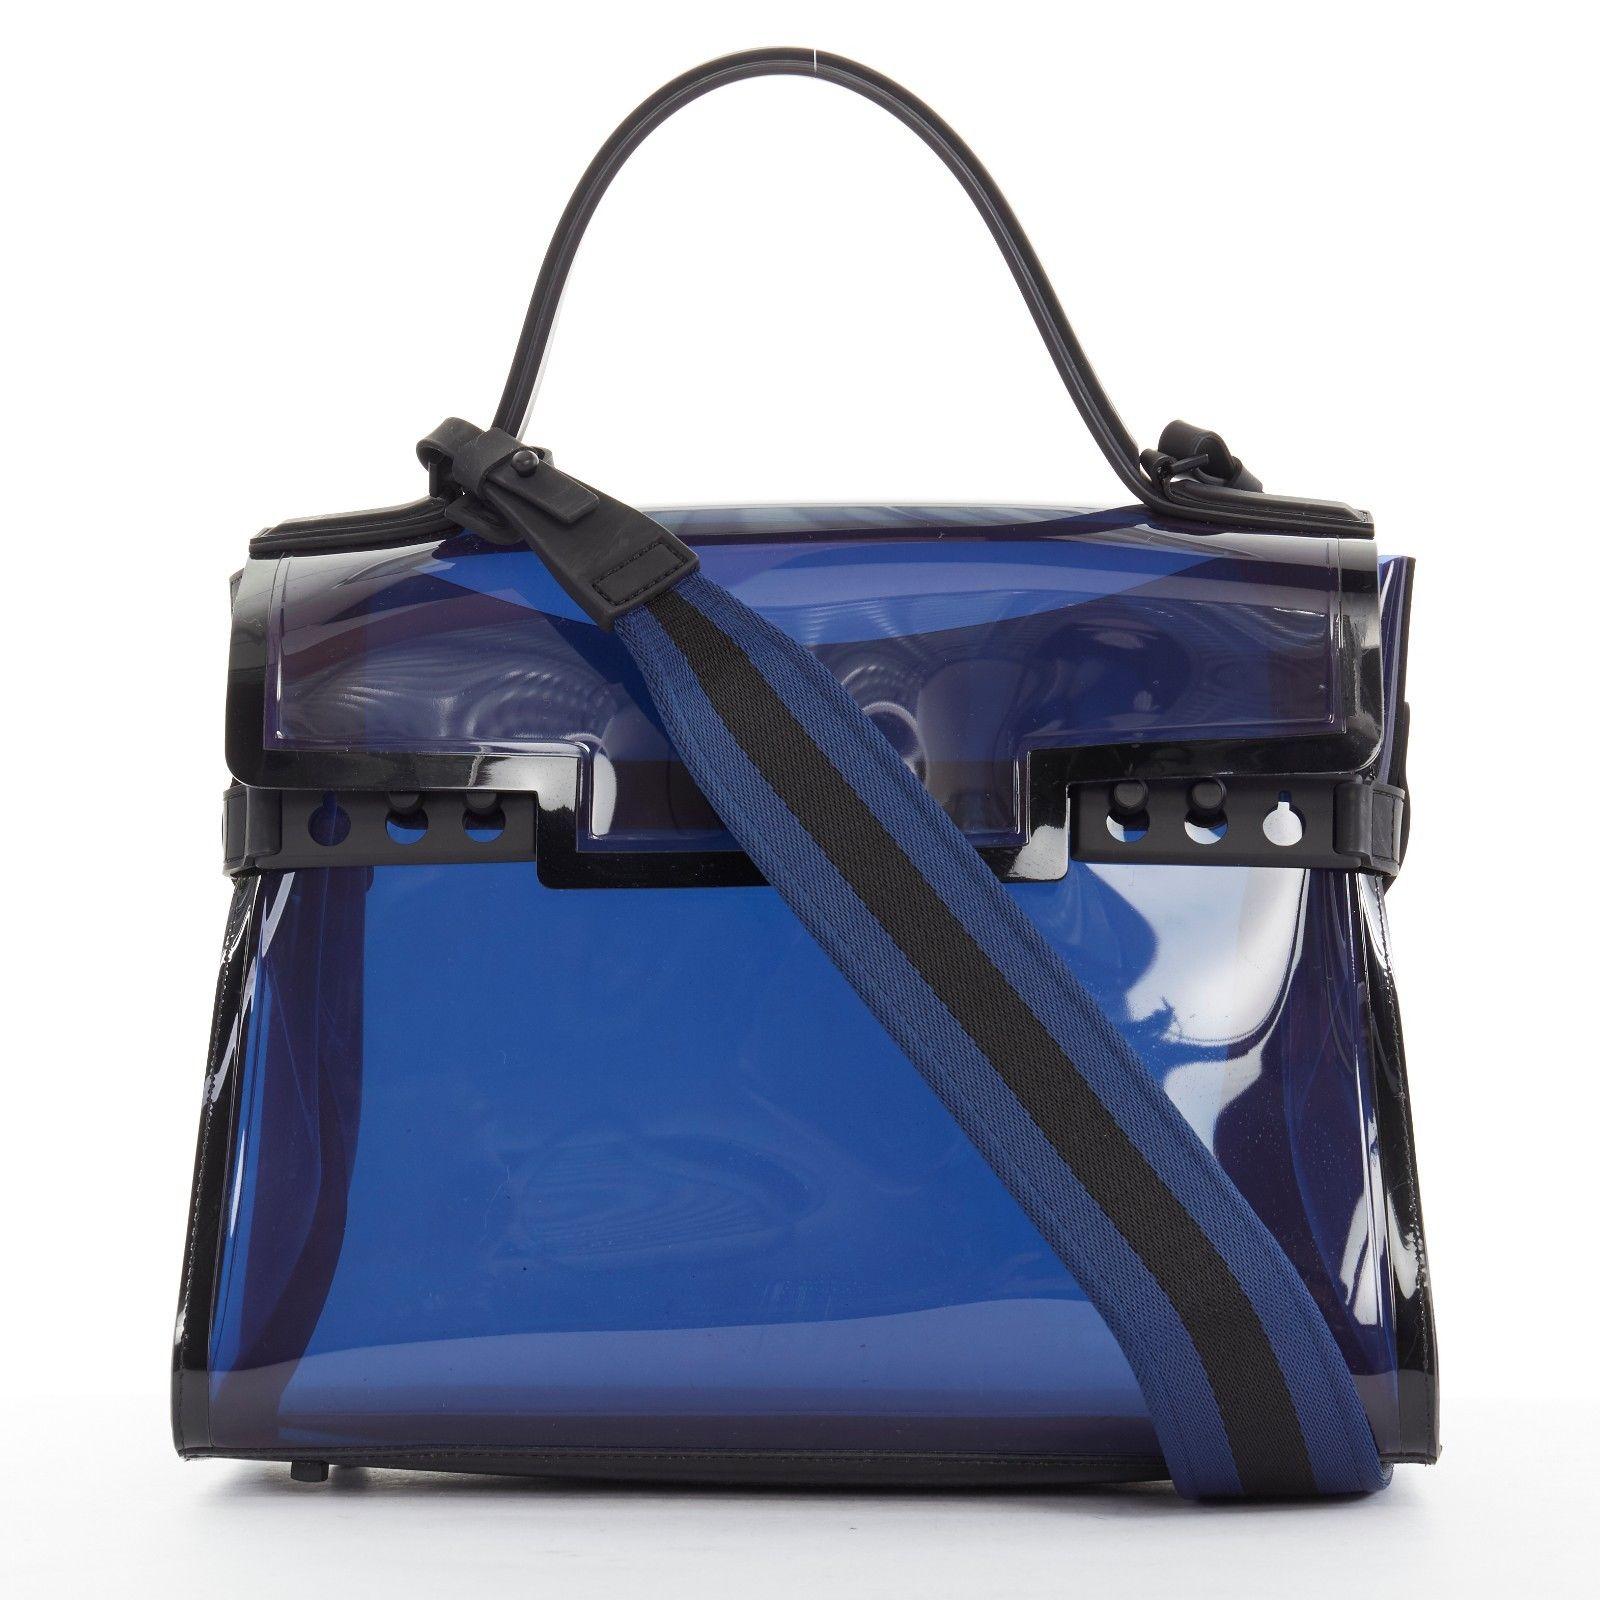 ea666c8027 Delvaux. limited DELVAUX Dark Night Tempete navy blue PVC top handle  shoulder kelly bag